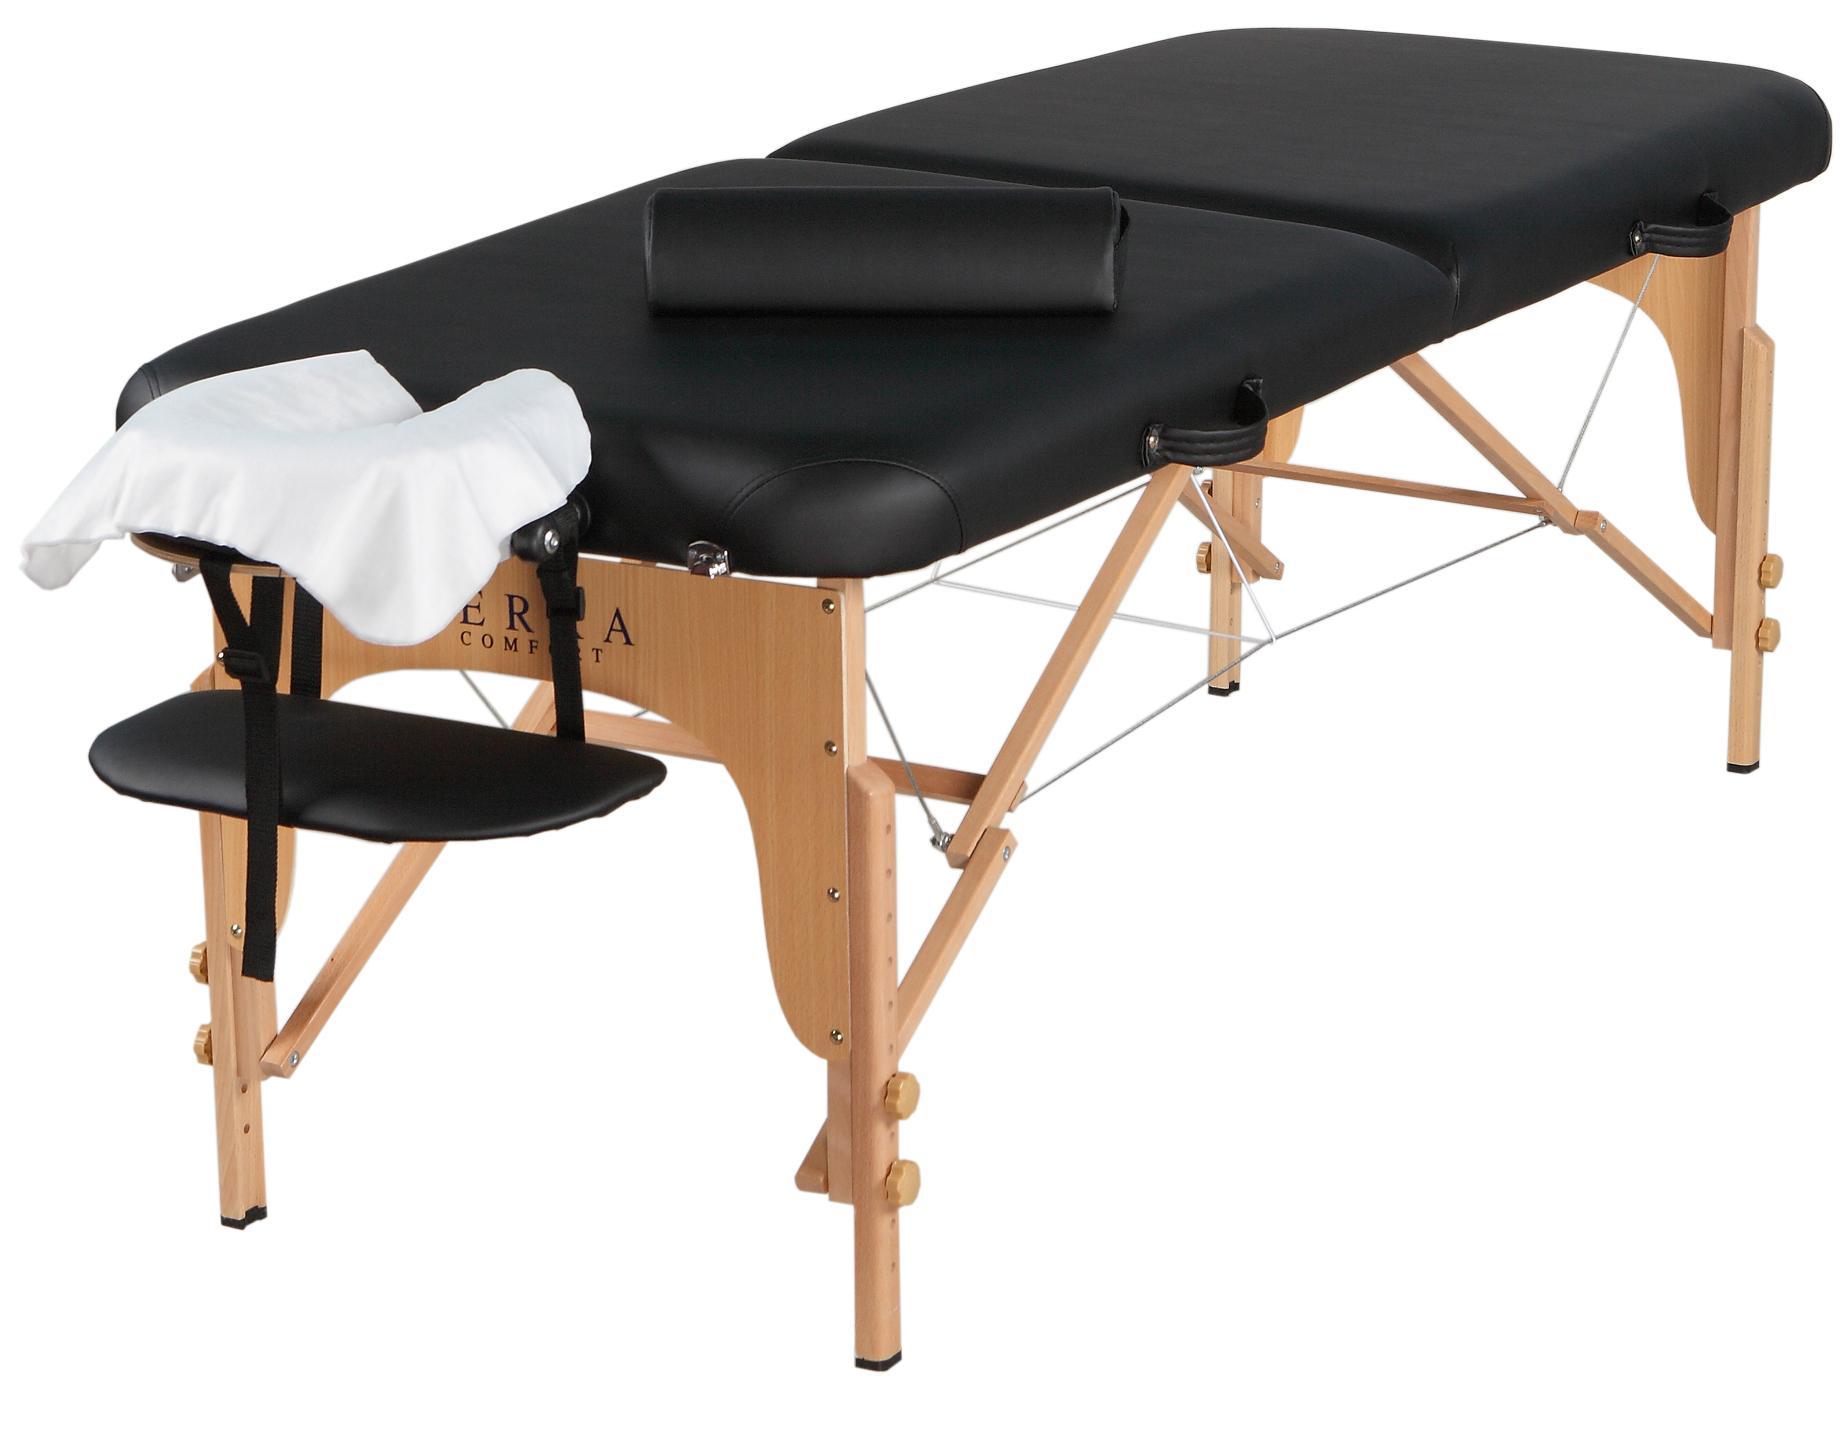 Sierra comfort professional series portable massage table sports outdoors - Massage table professional ...